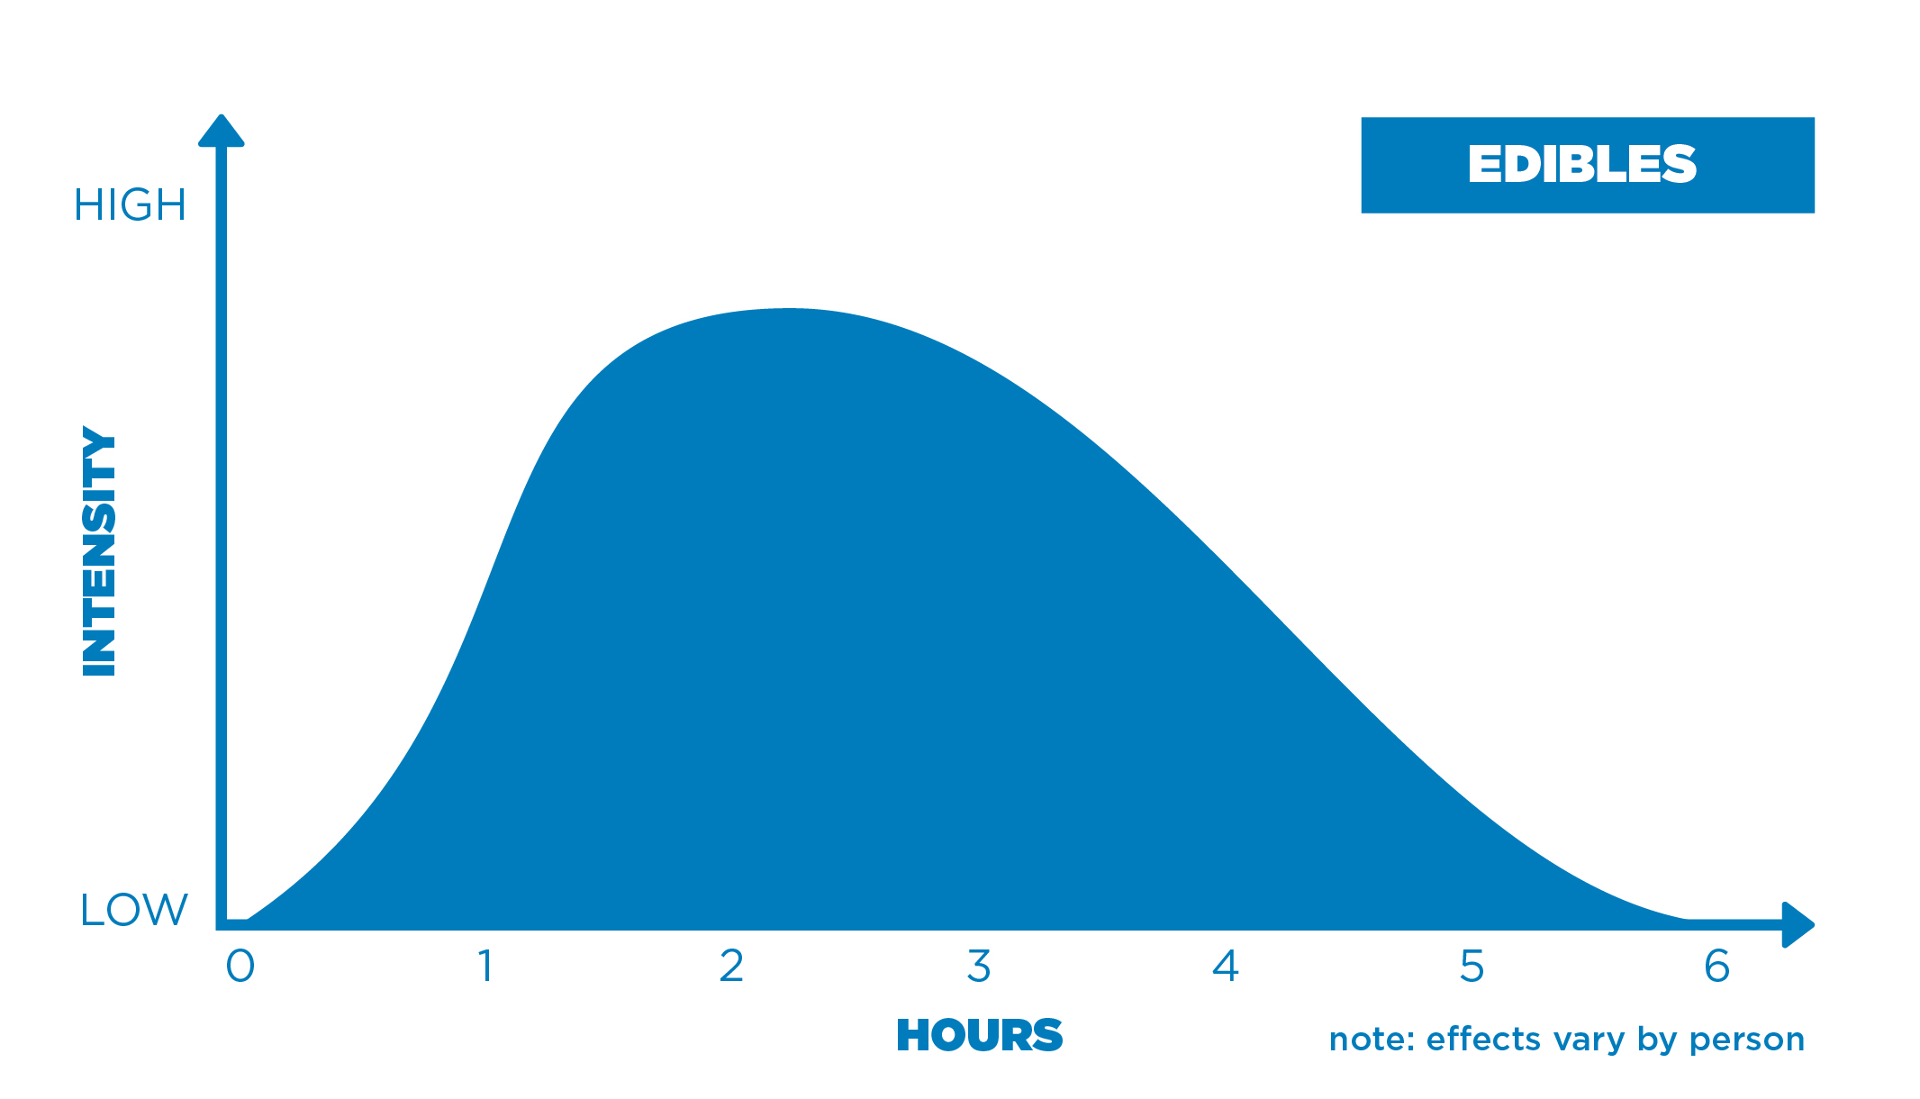 Edible intensity chart